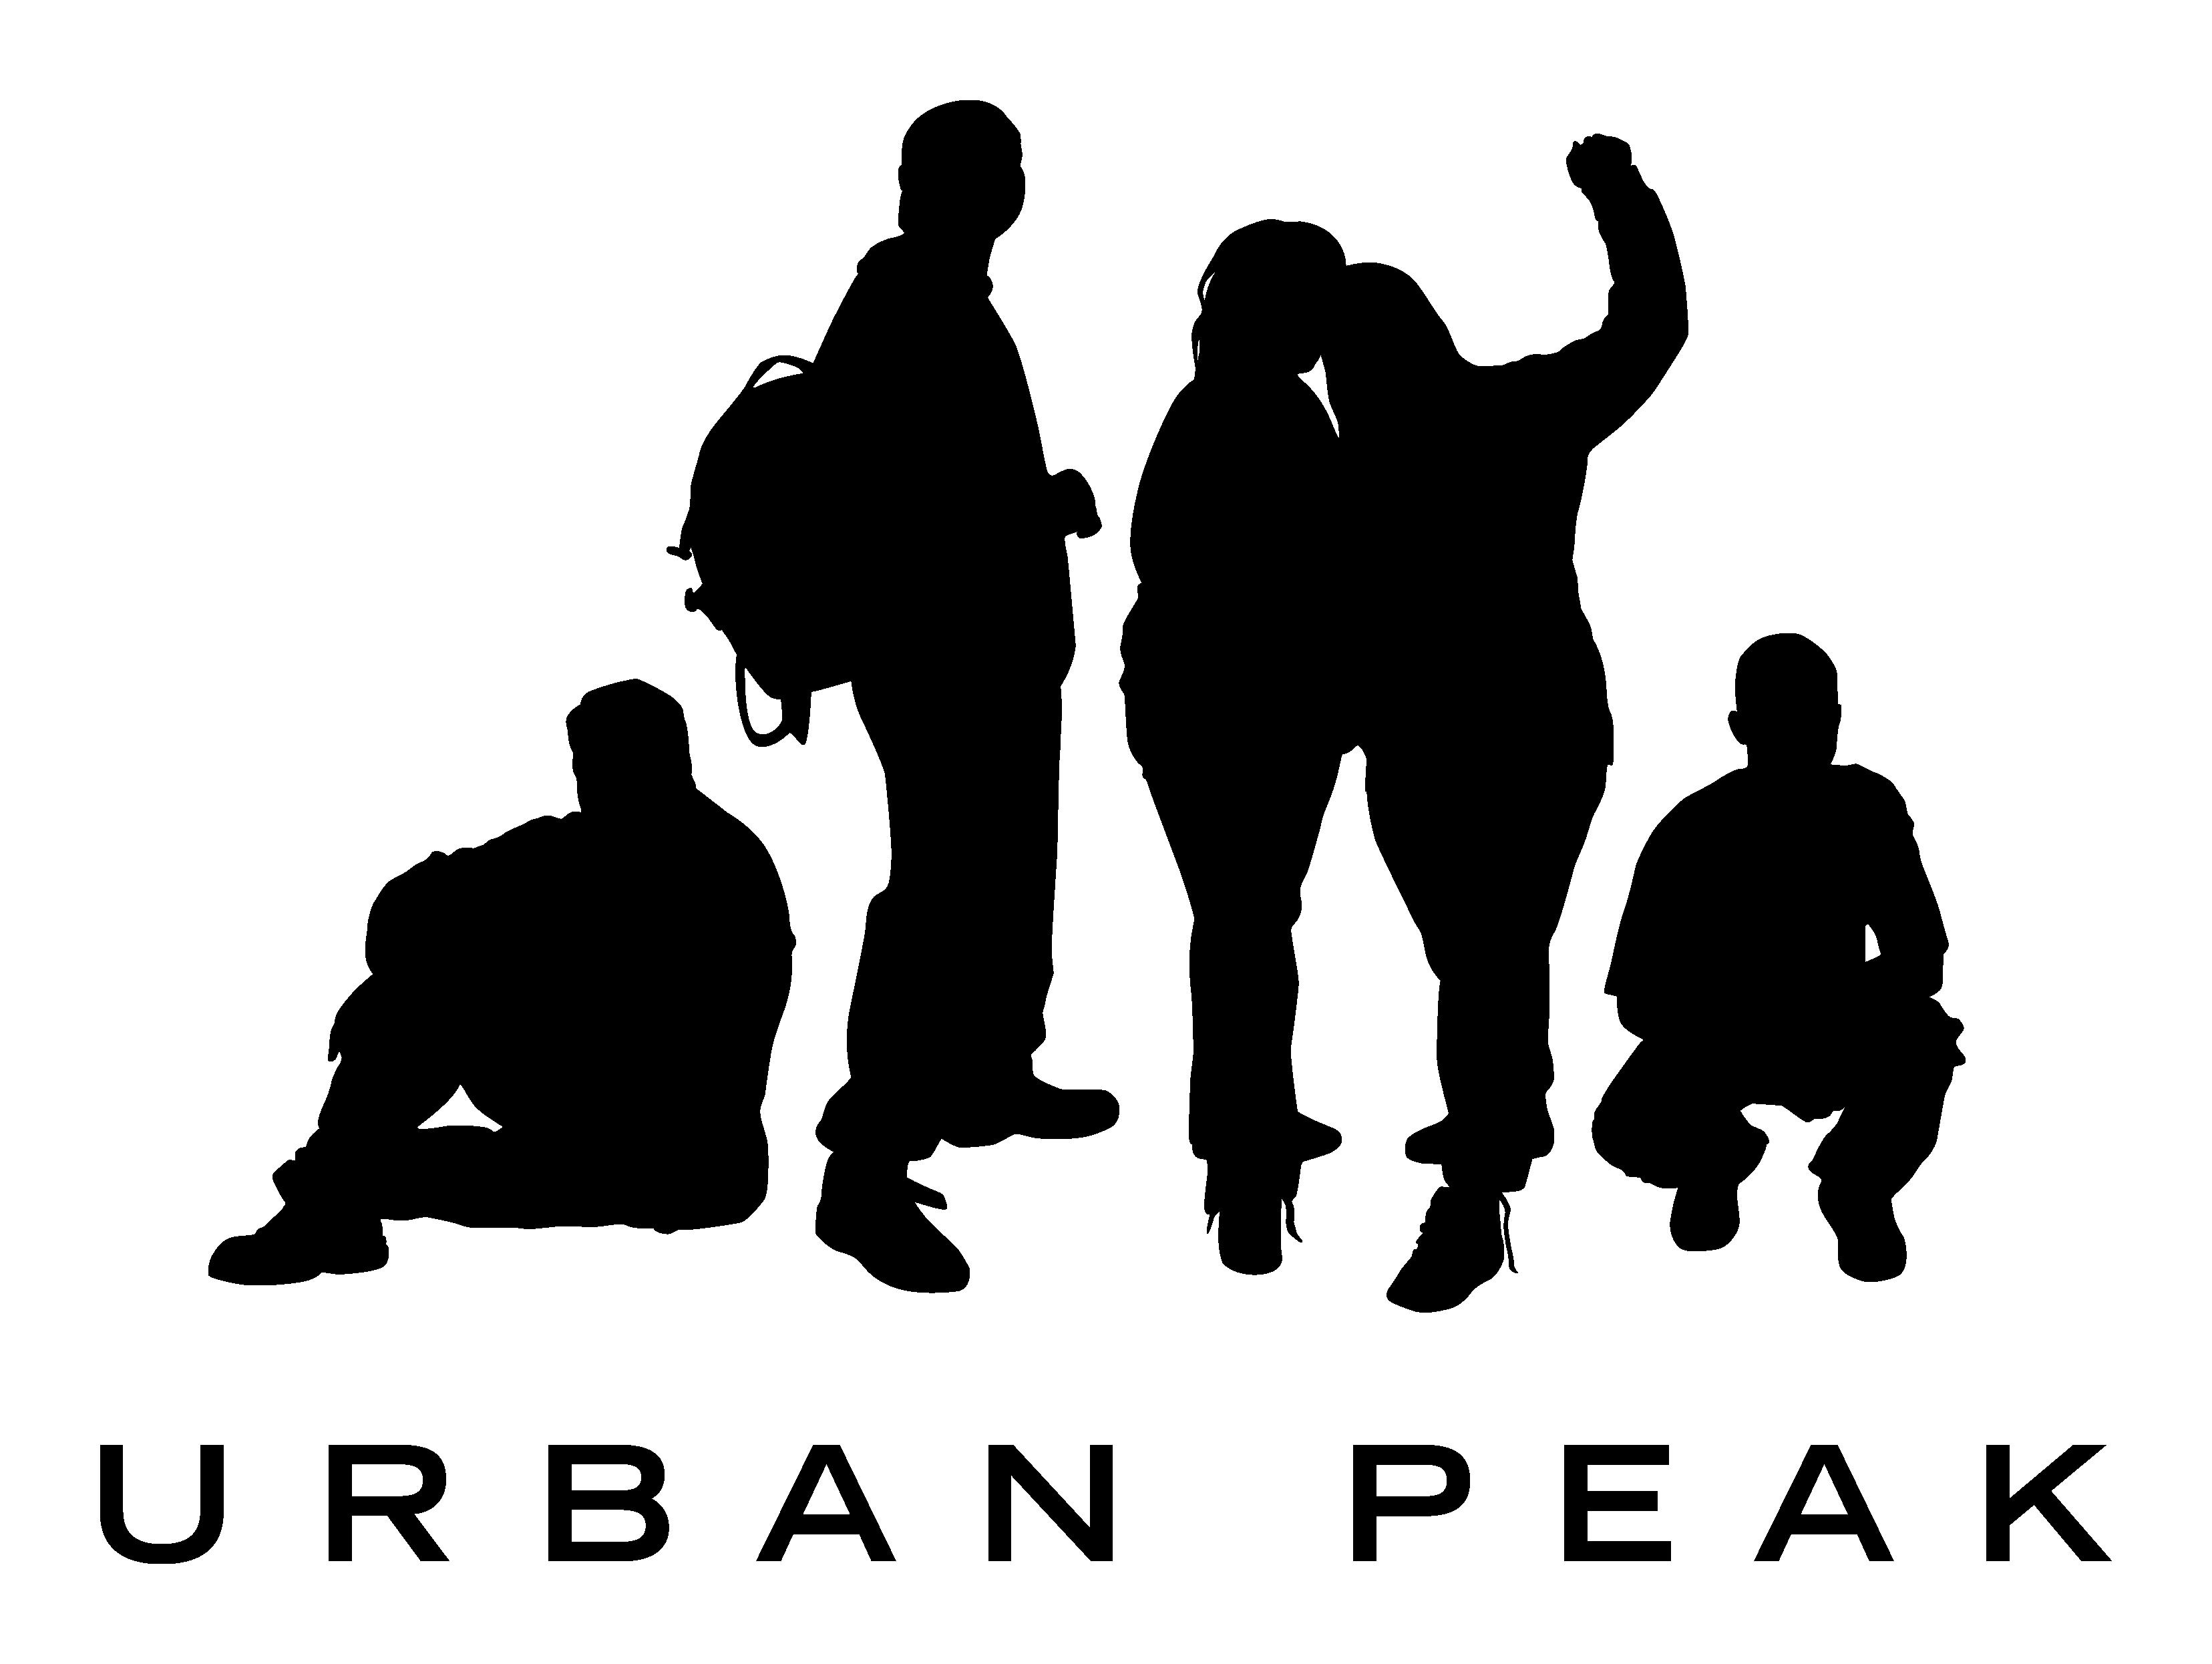 https://waypointcollective.com/wp-content/uploads/2020/11/Urban-Peak-logo-3.png